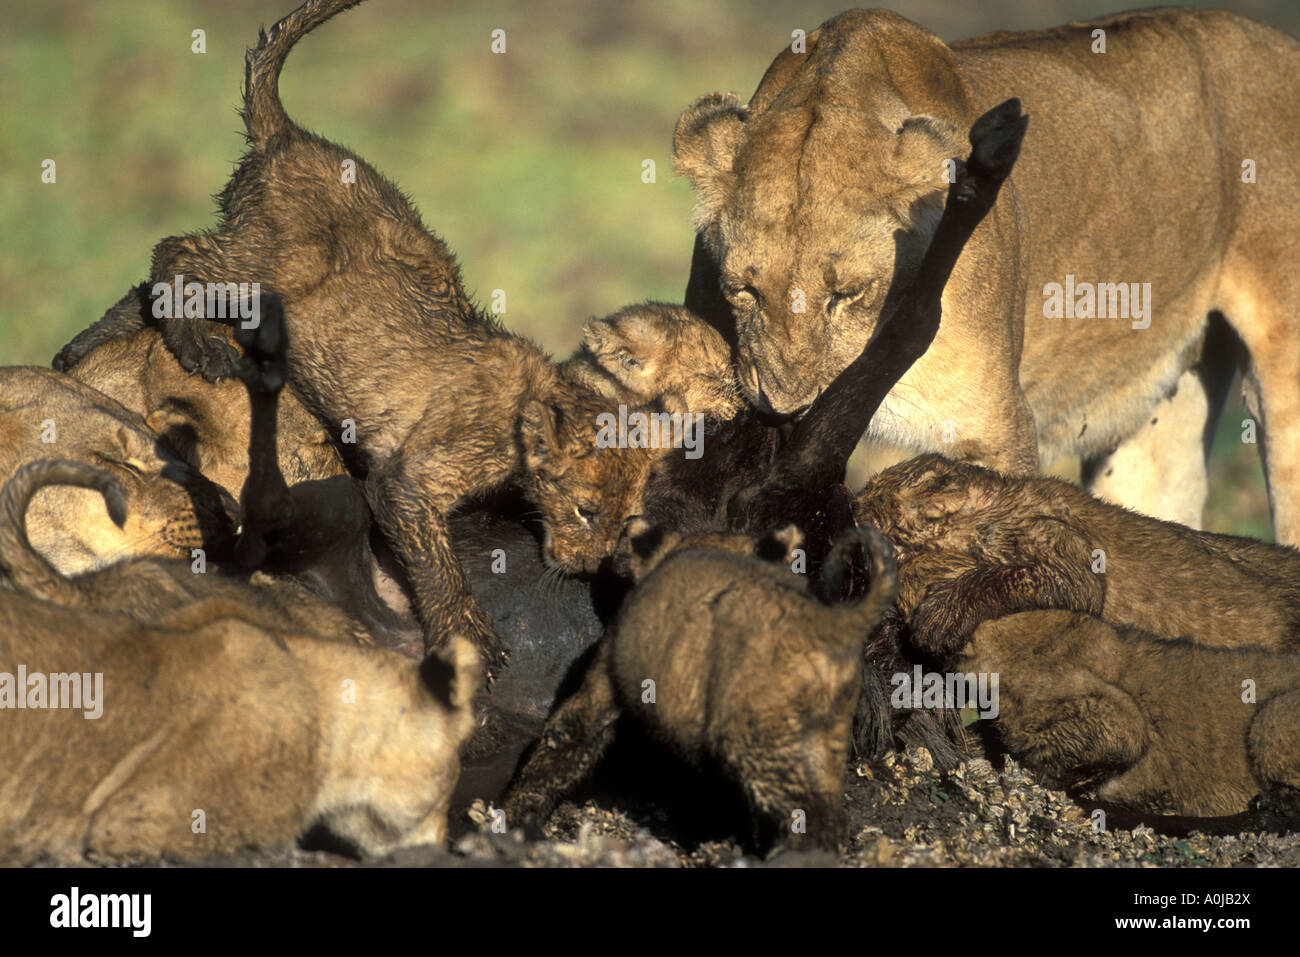 Africa Kenya Masai Mara Game Reserve Mud covered Lion pride Panthera leo feeds on wildebeest kill in Musiara Marsh Stock Photo